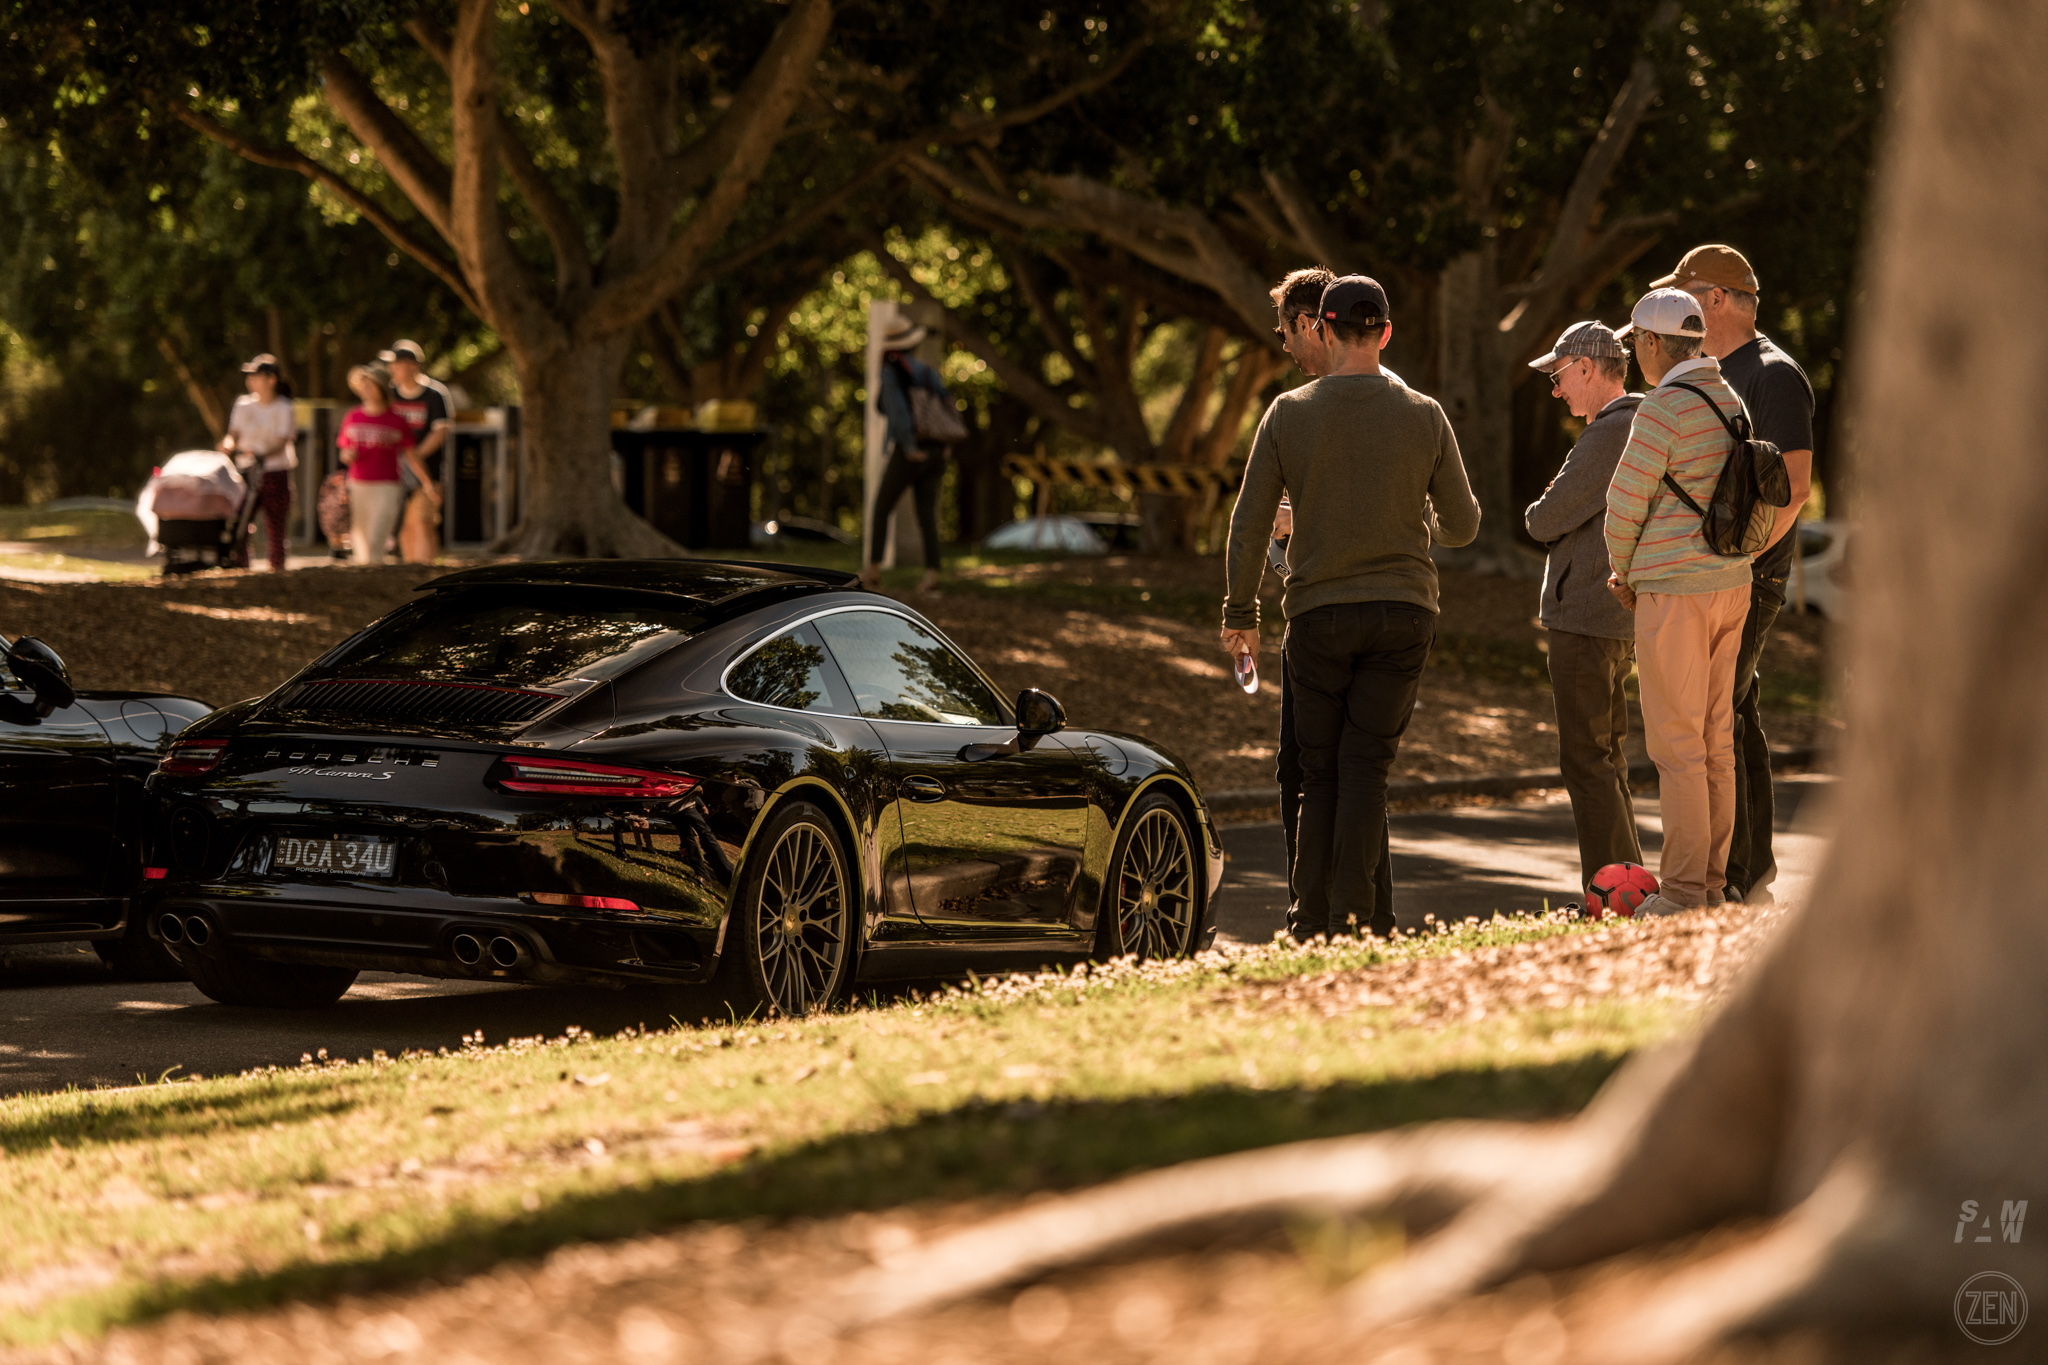 2019-10-27 - Autohaus Porsches & Coffee 147